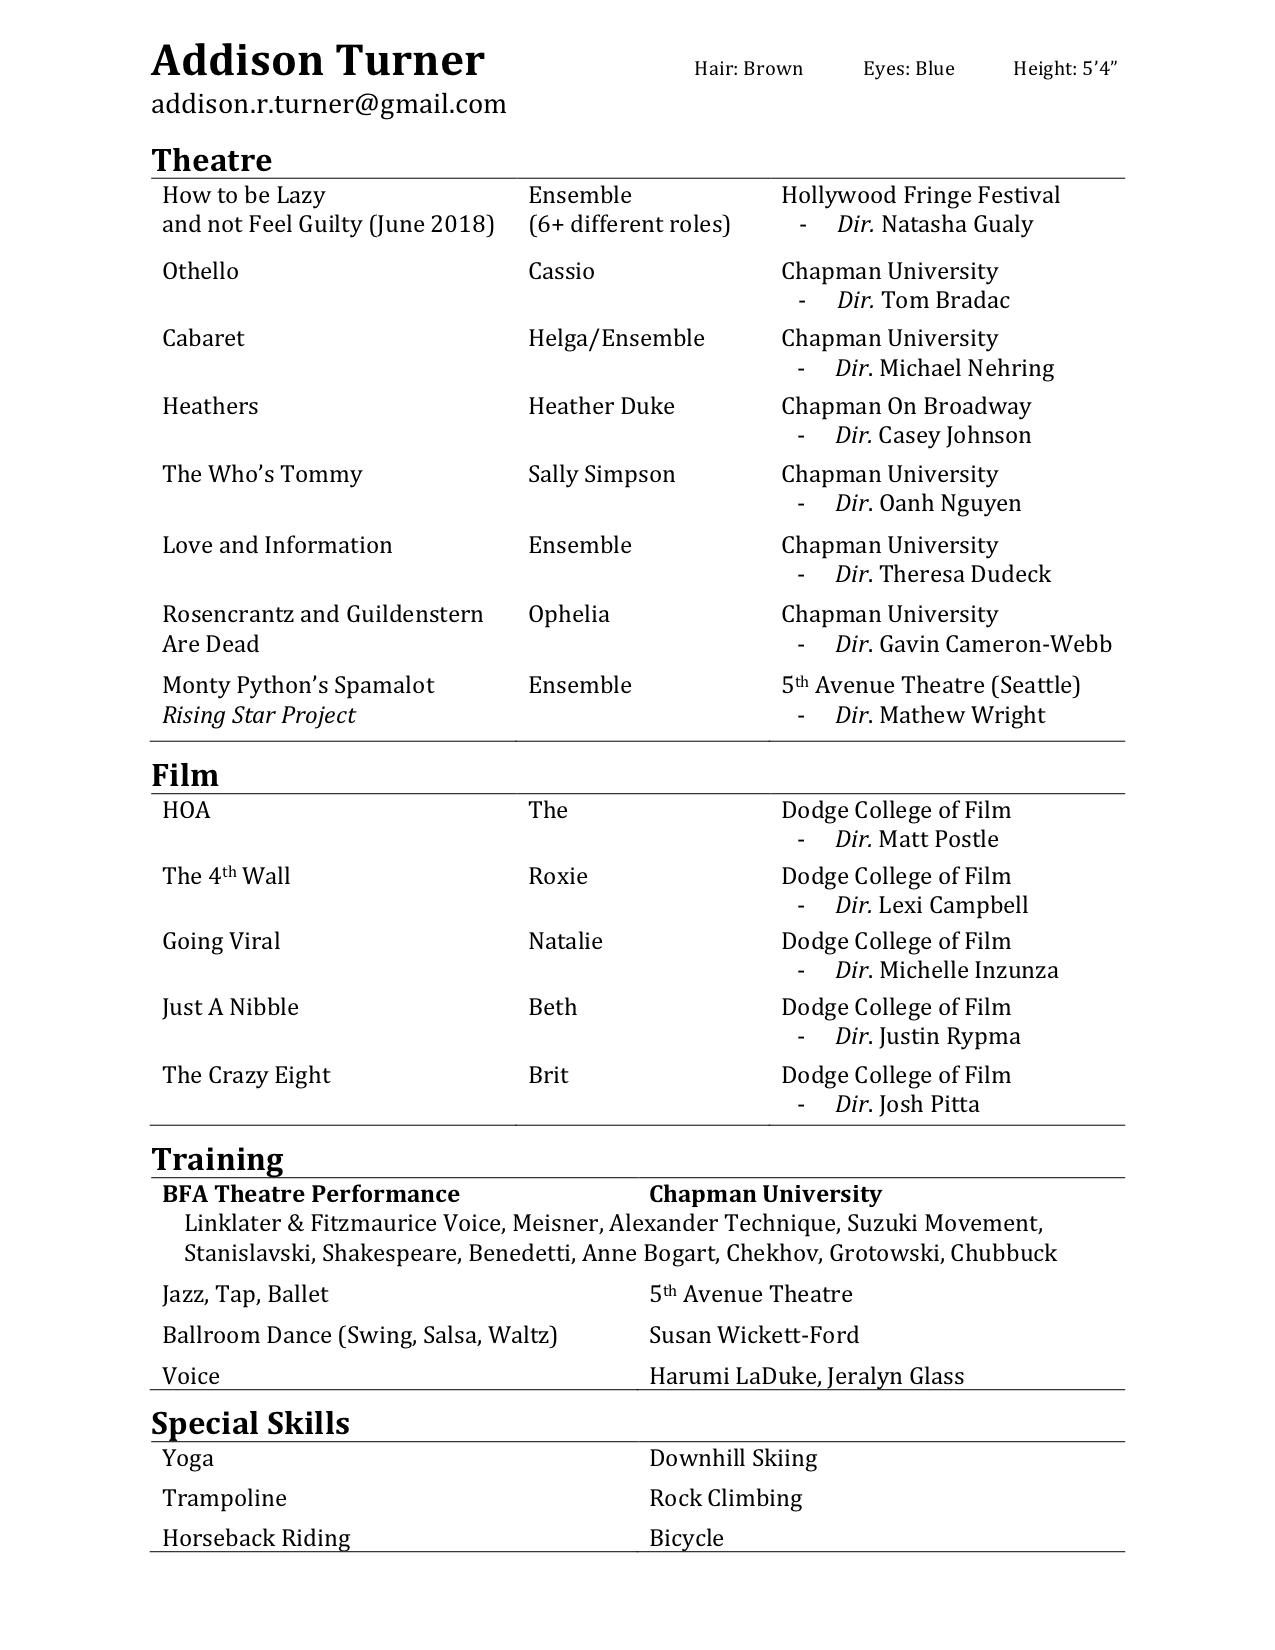 Addison Turner Resume.jpg